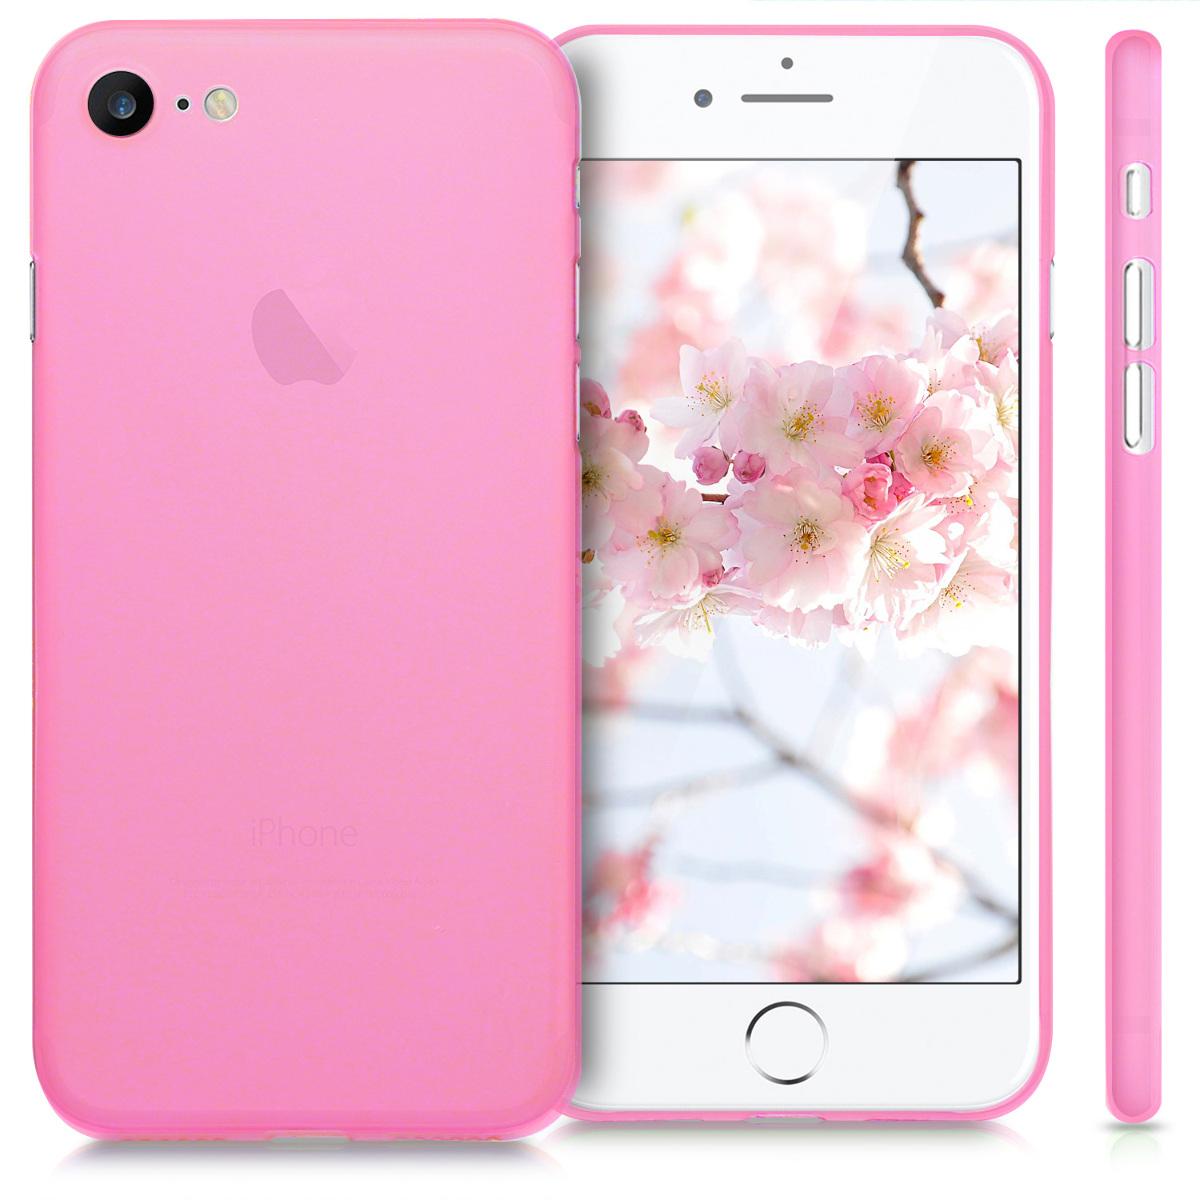 Coque ultra fine pour apple iphone 7 8 housse protection for Housse protection iphone 7